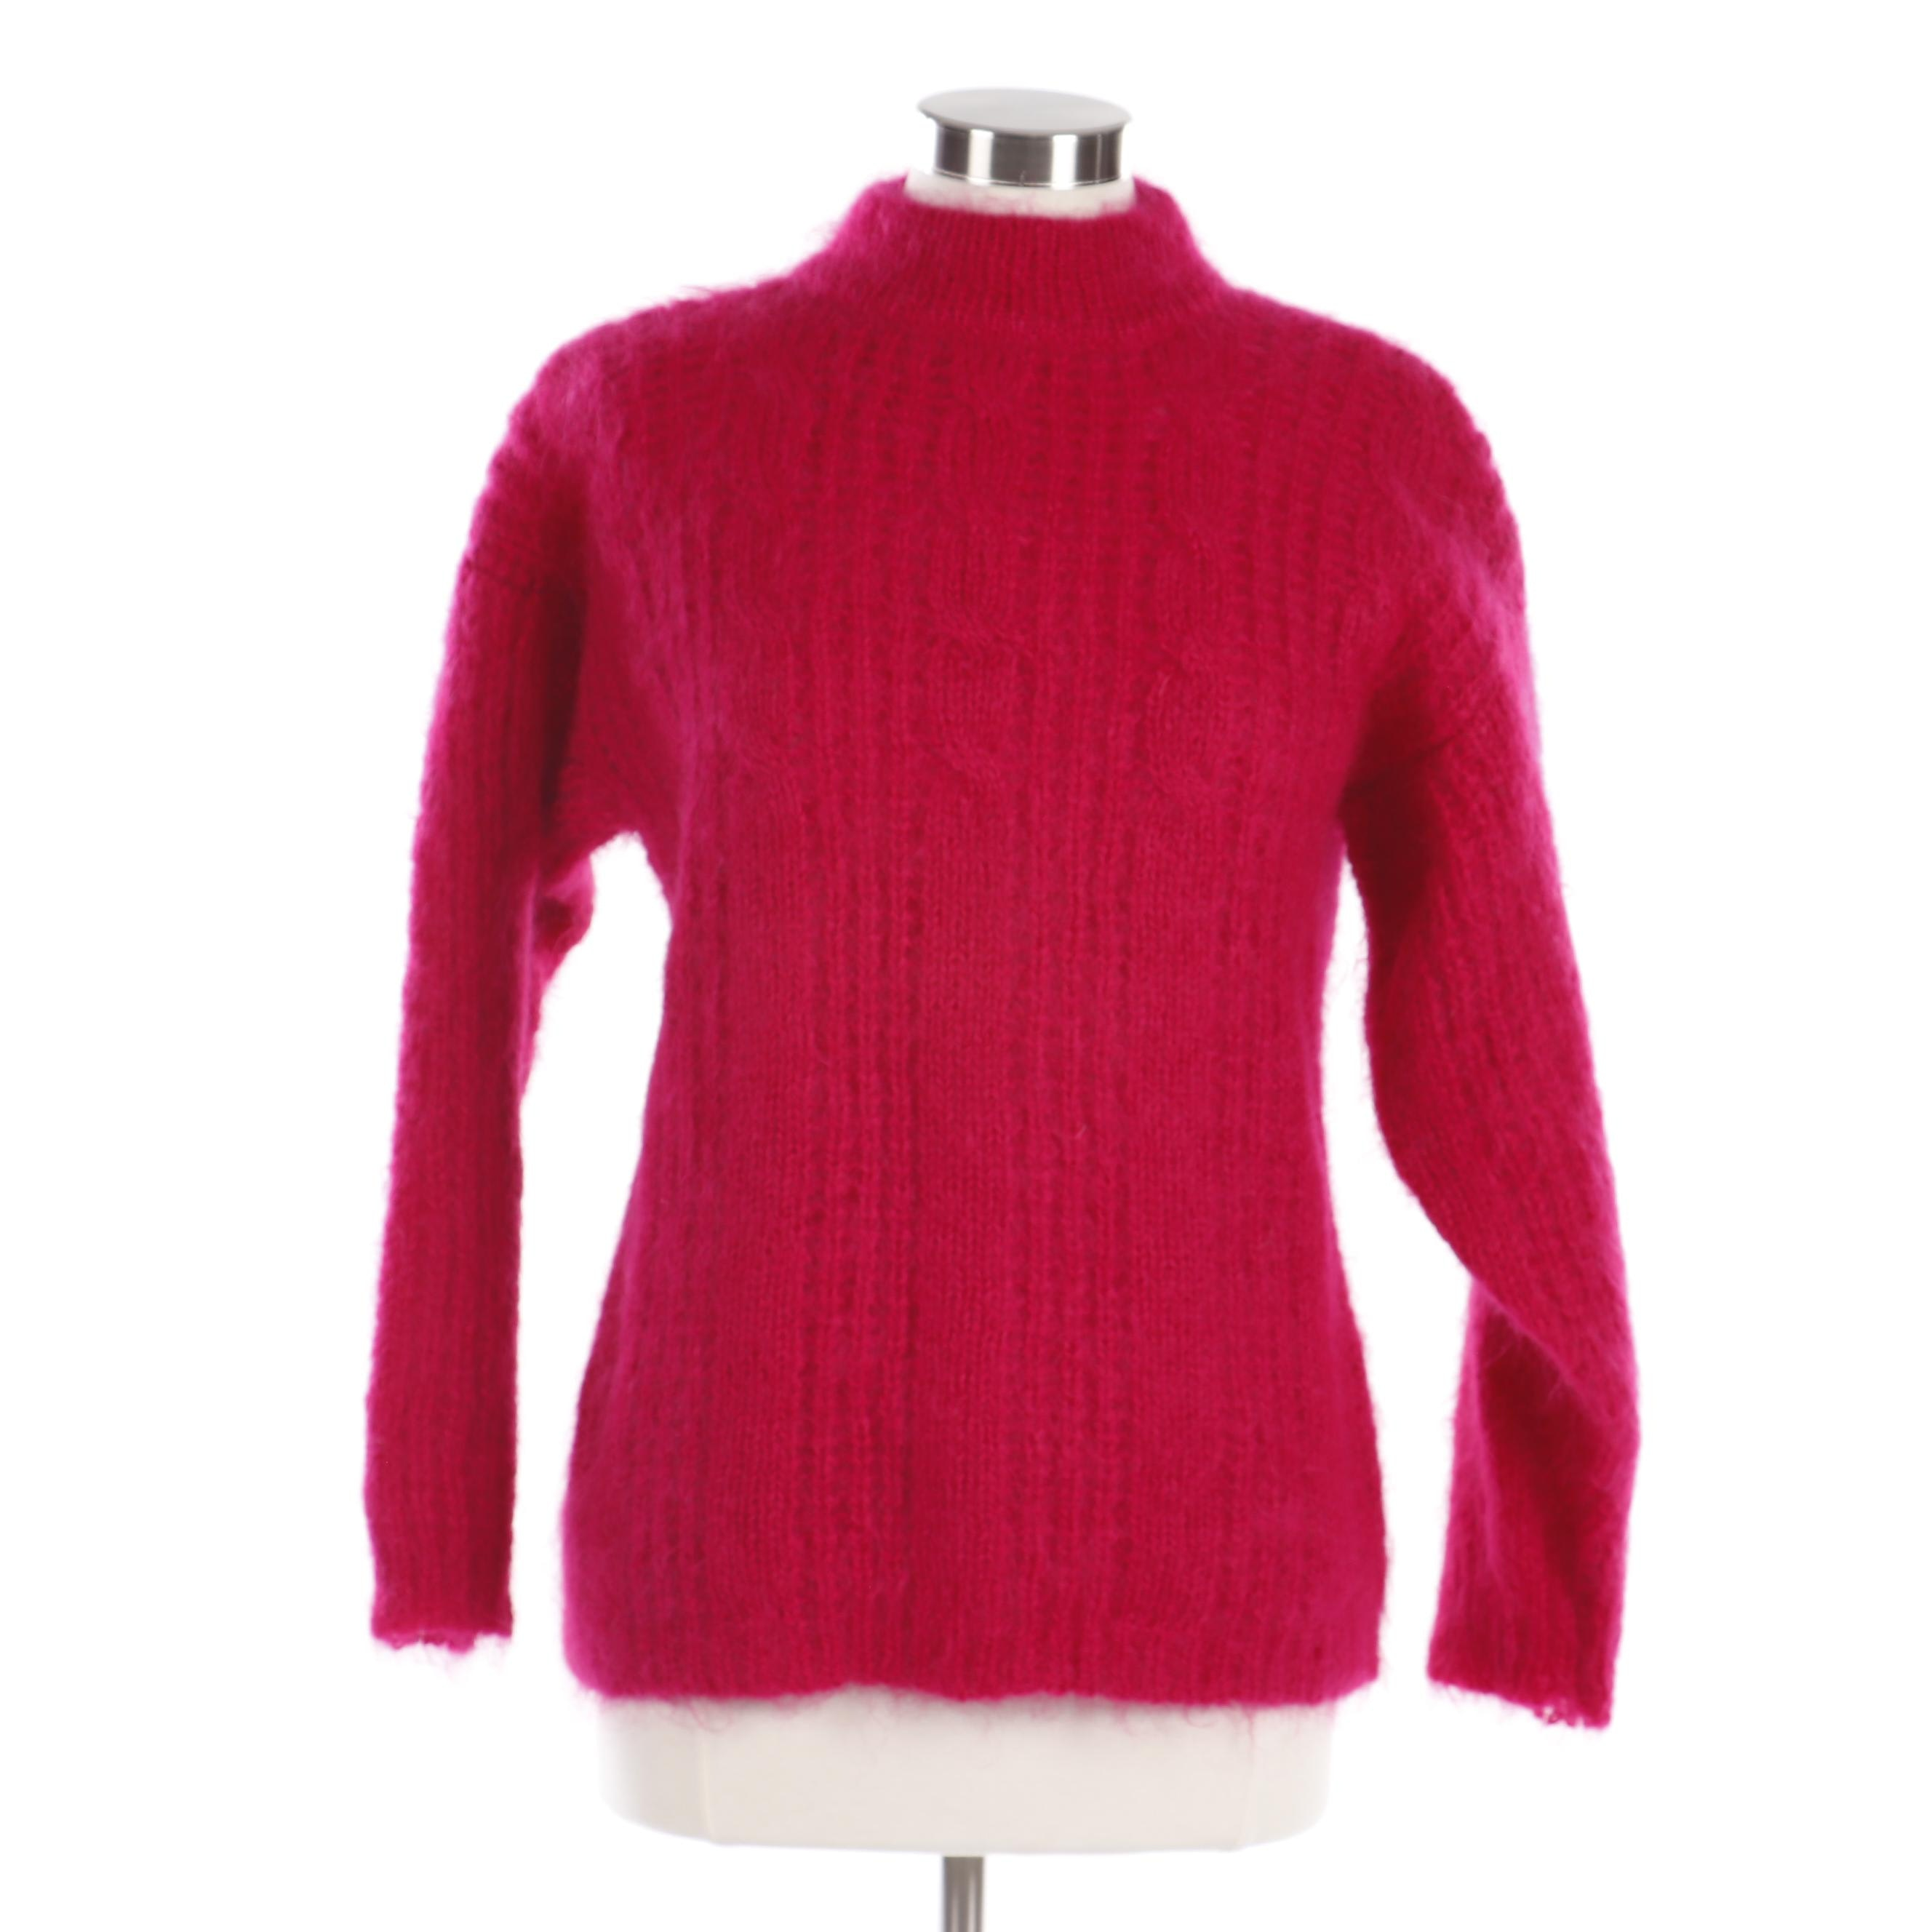 Women's Chelsea Young Fuchsia Wool Blend Knit Sweater